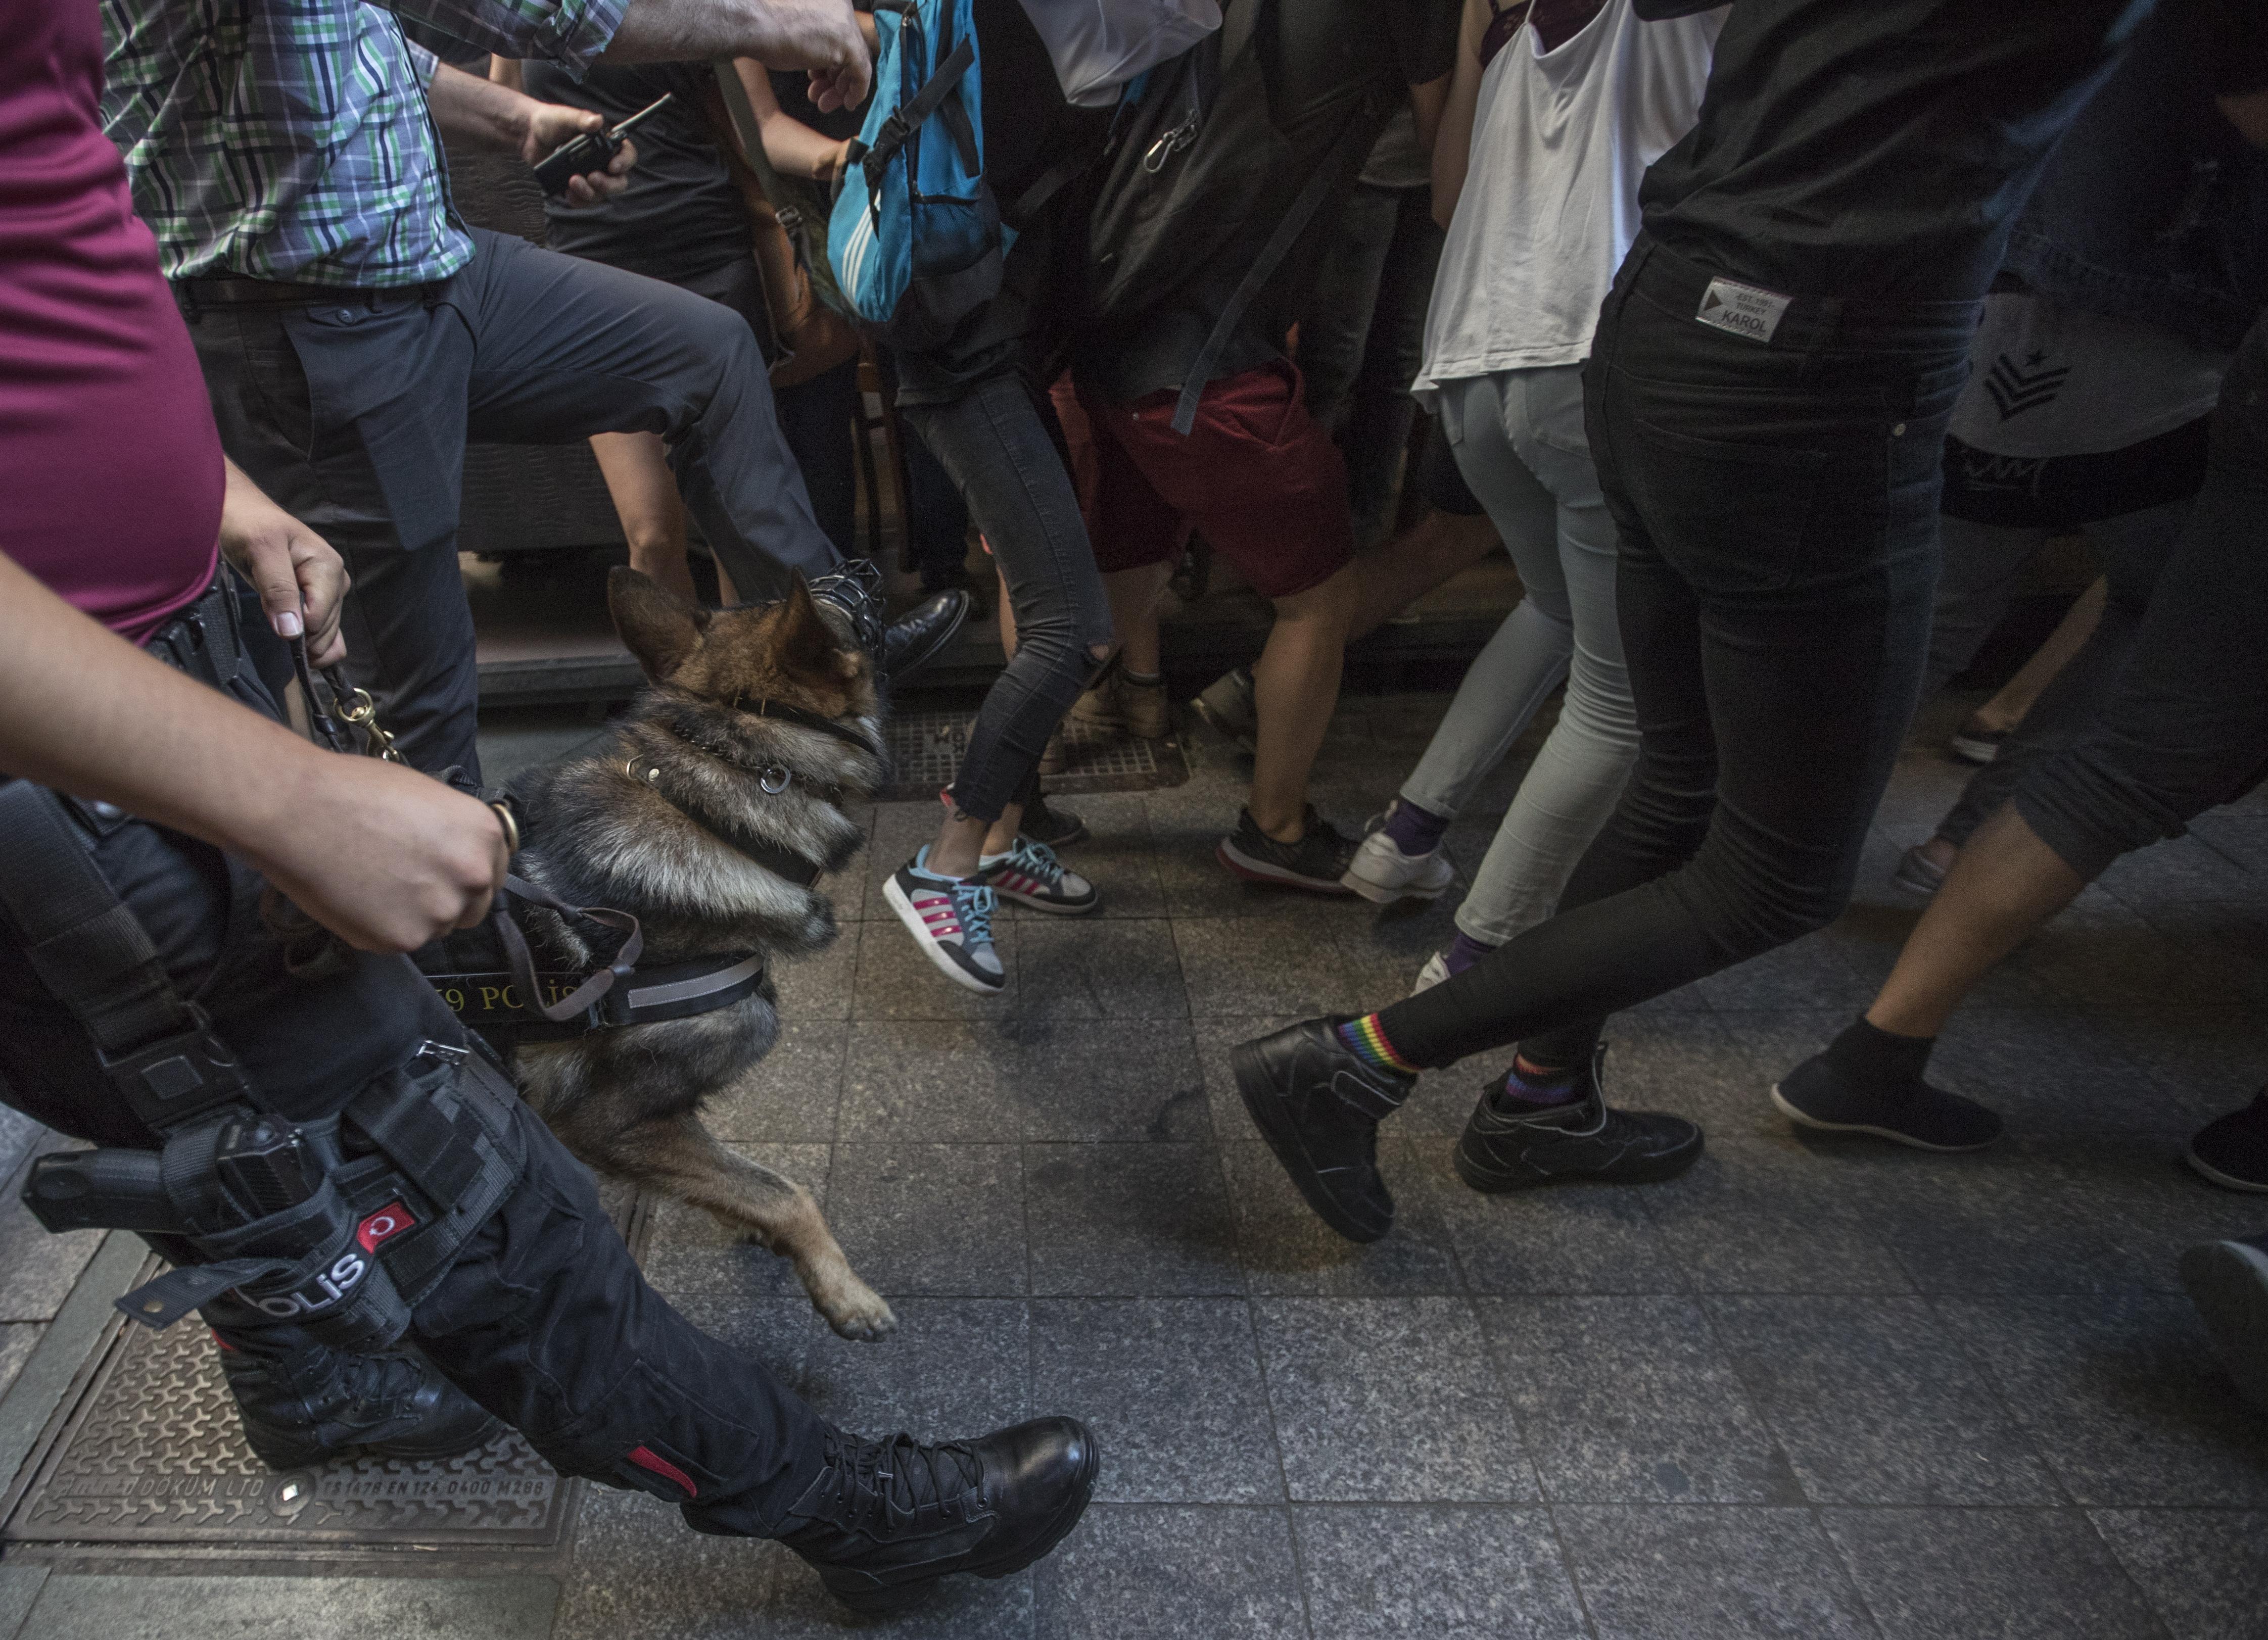 Turska po četvrti put zabranila Paradu ponosa